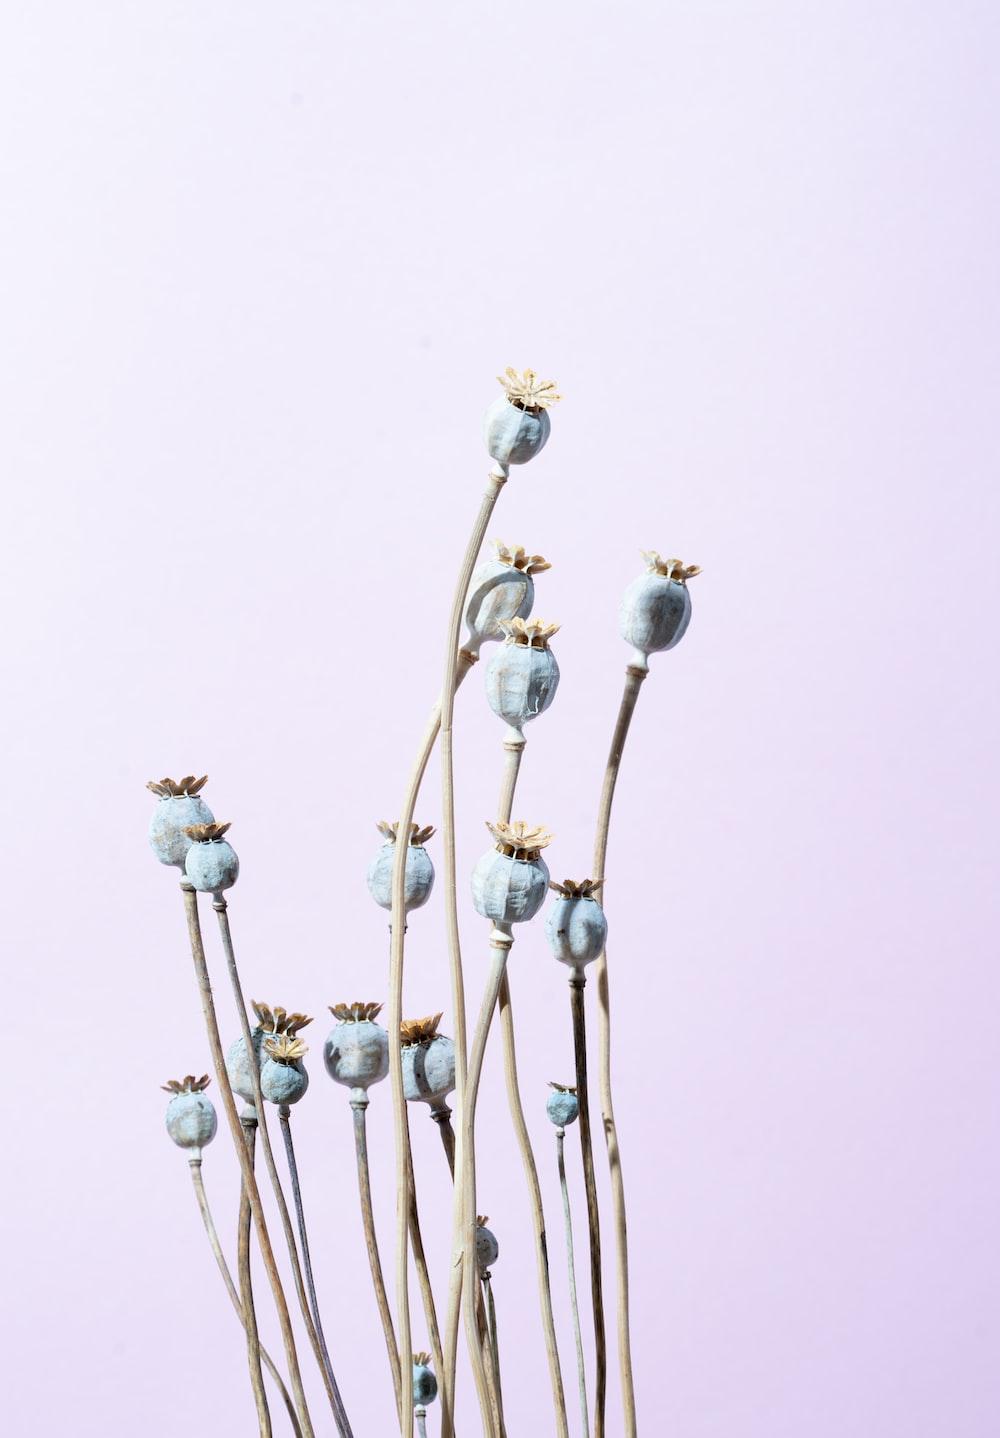 blue-petaled flowers